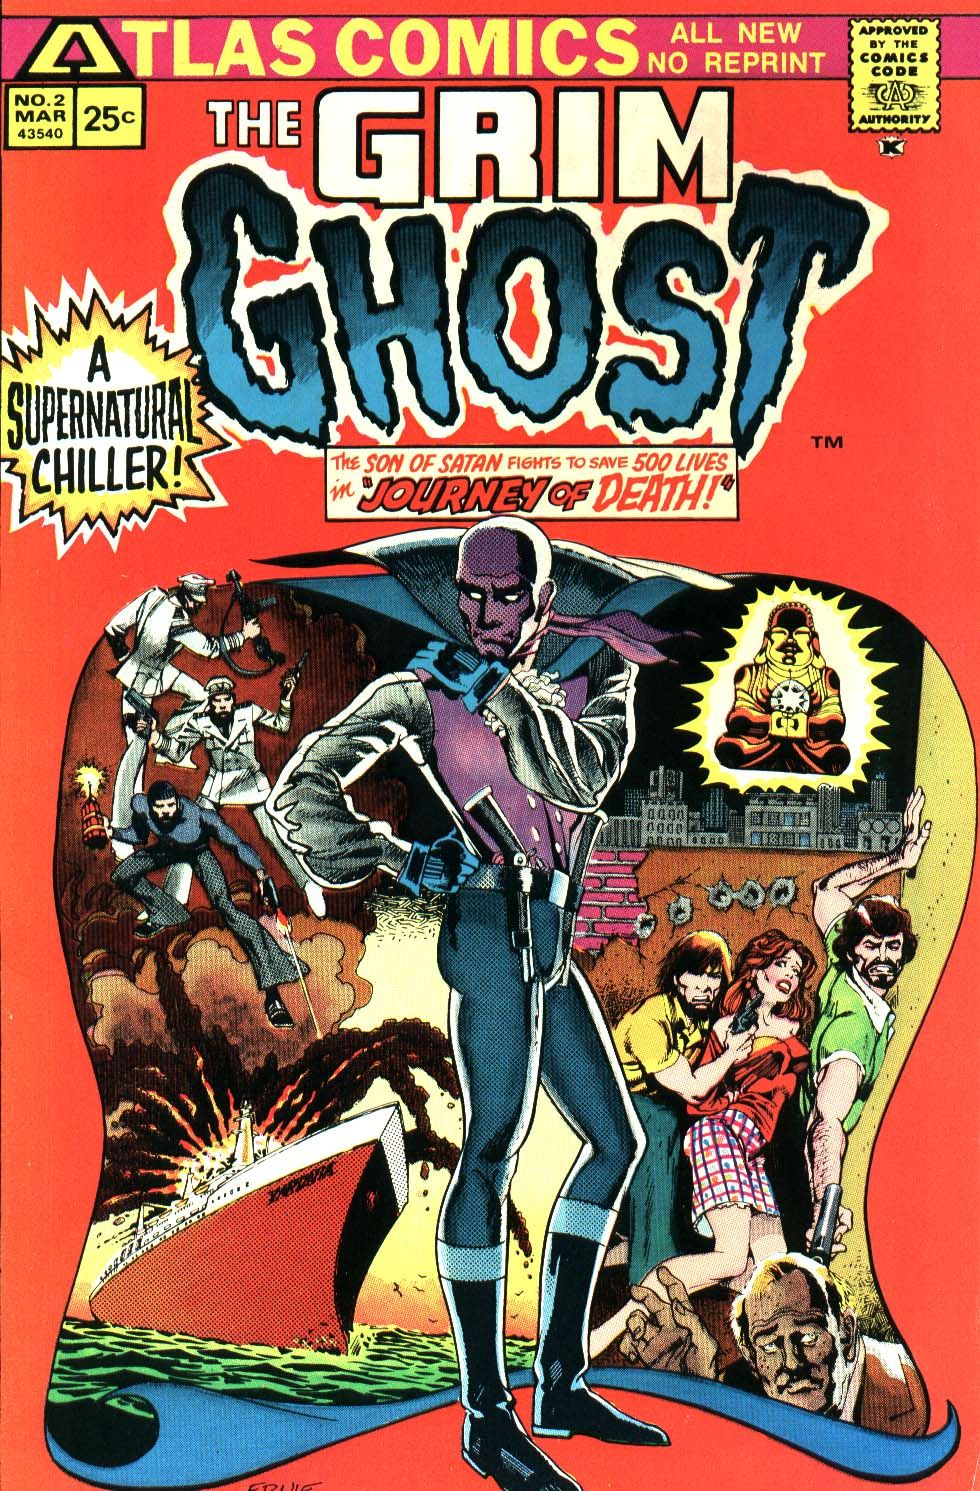 The Grim Ghost # 2, March 1975, Pencils:Ernie Colon